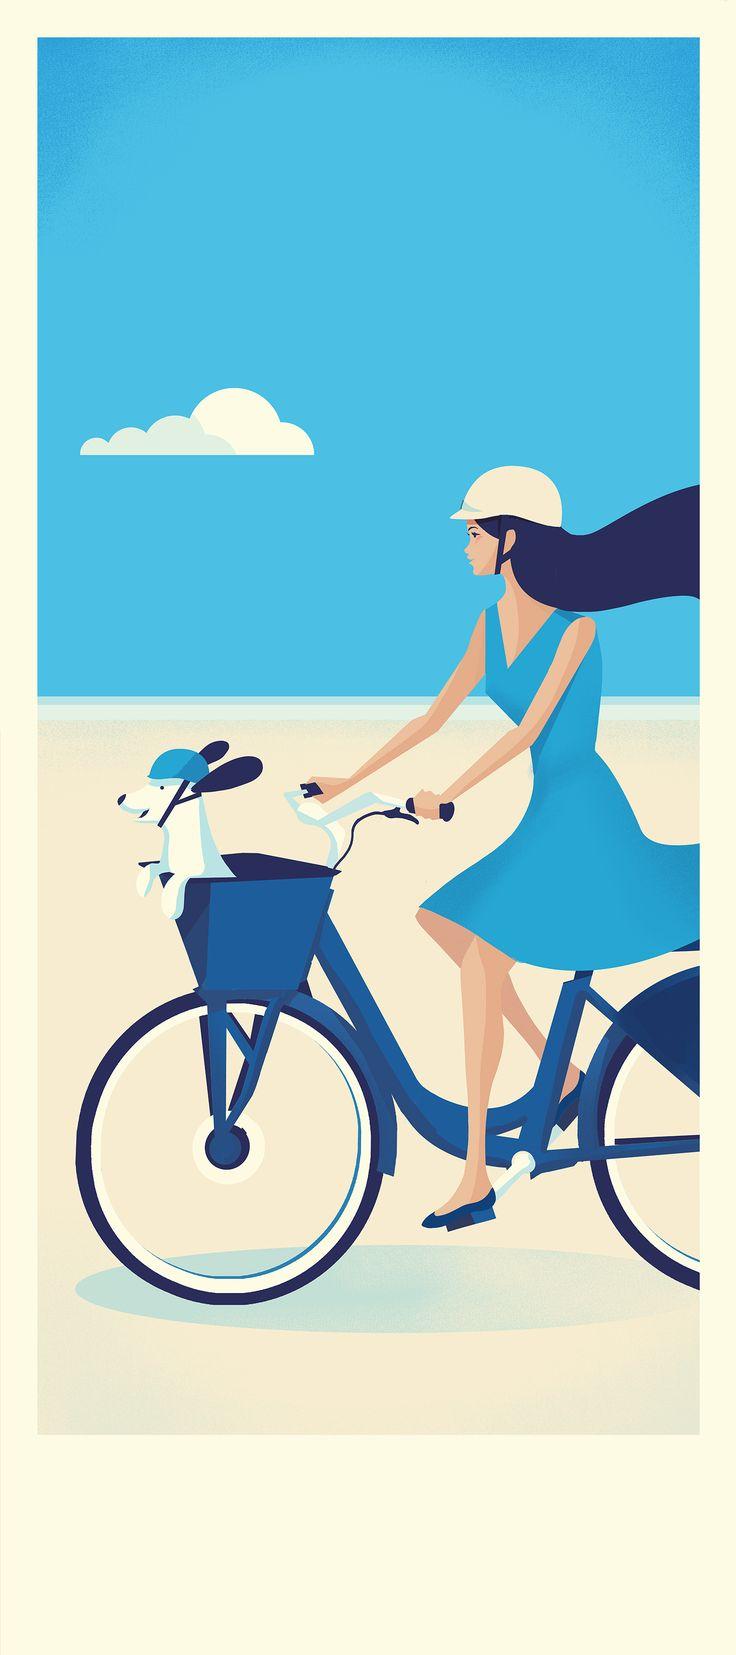 Citi Bike Miami by Pietari Posti   Agent Pekka